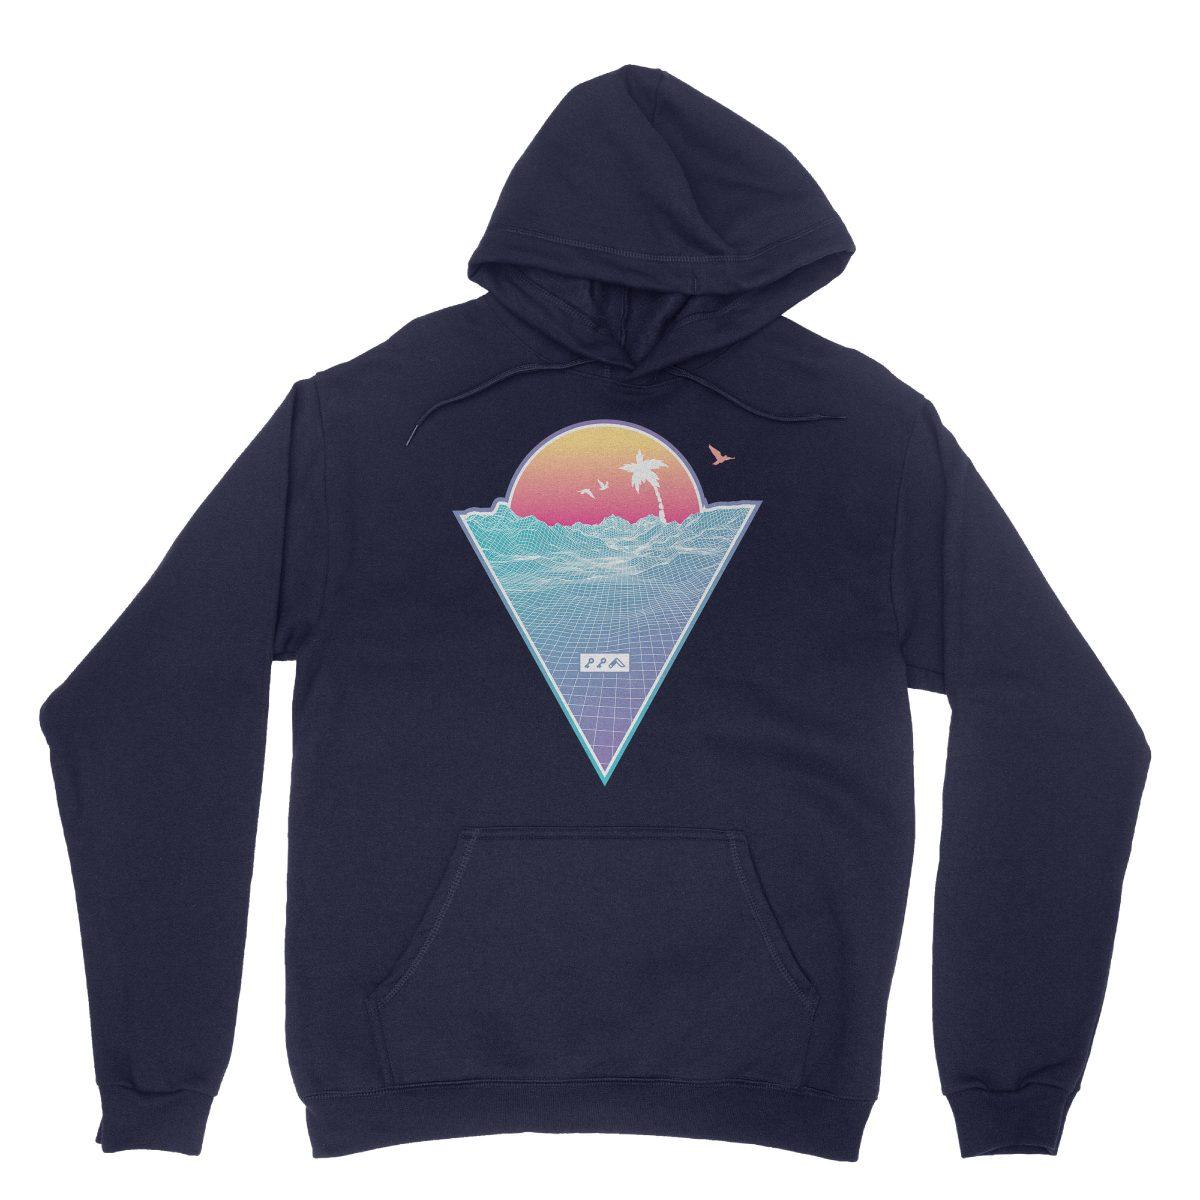 """OFF THE GRID"" cali vibes retro 80s design hoodie sweatshirts navy by kikicutt"